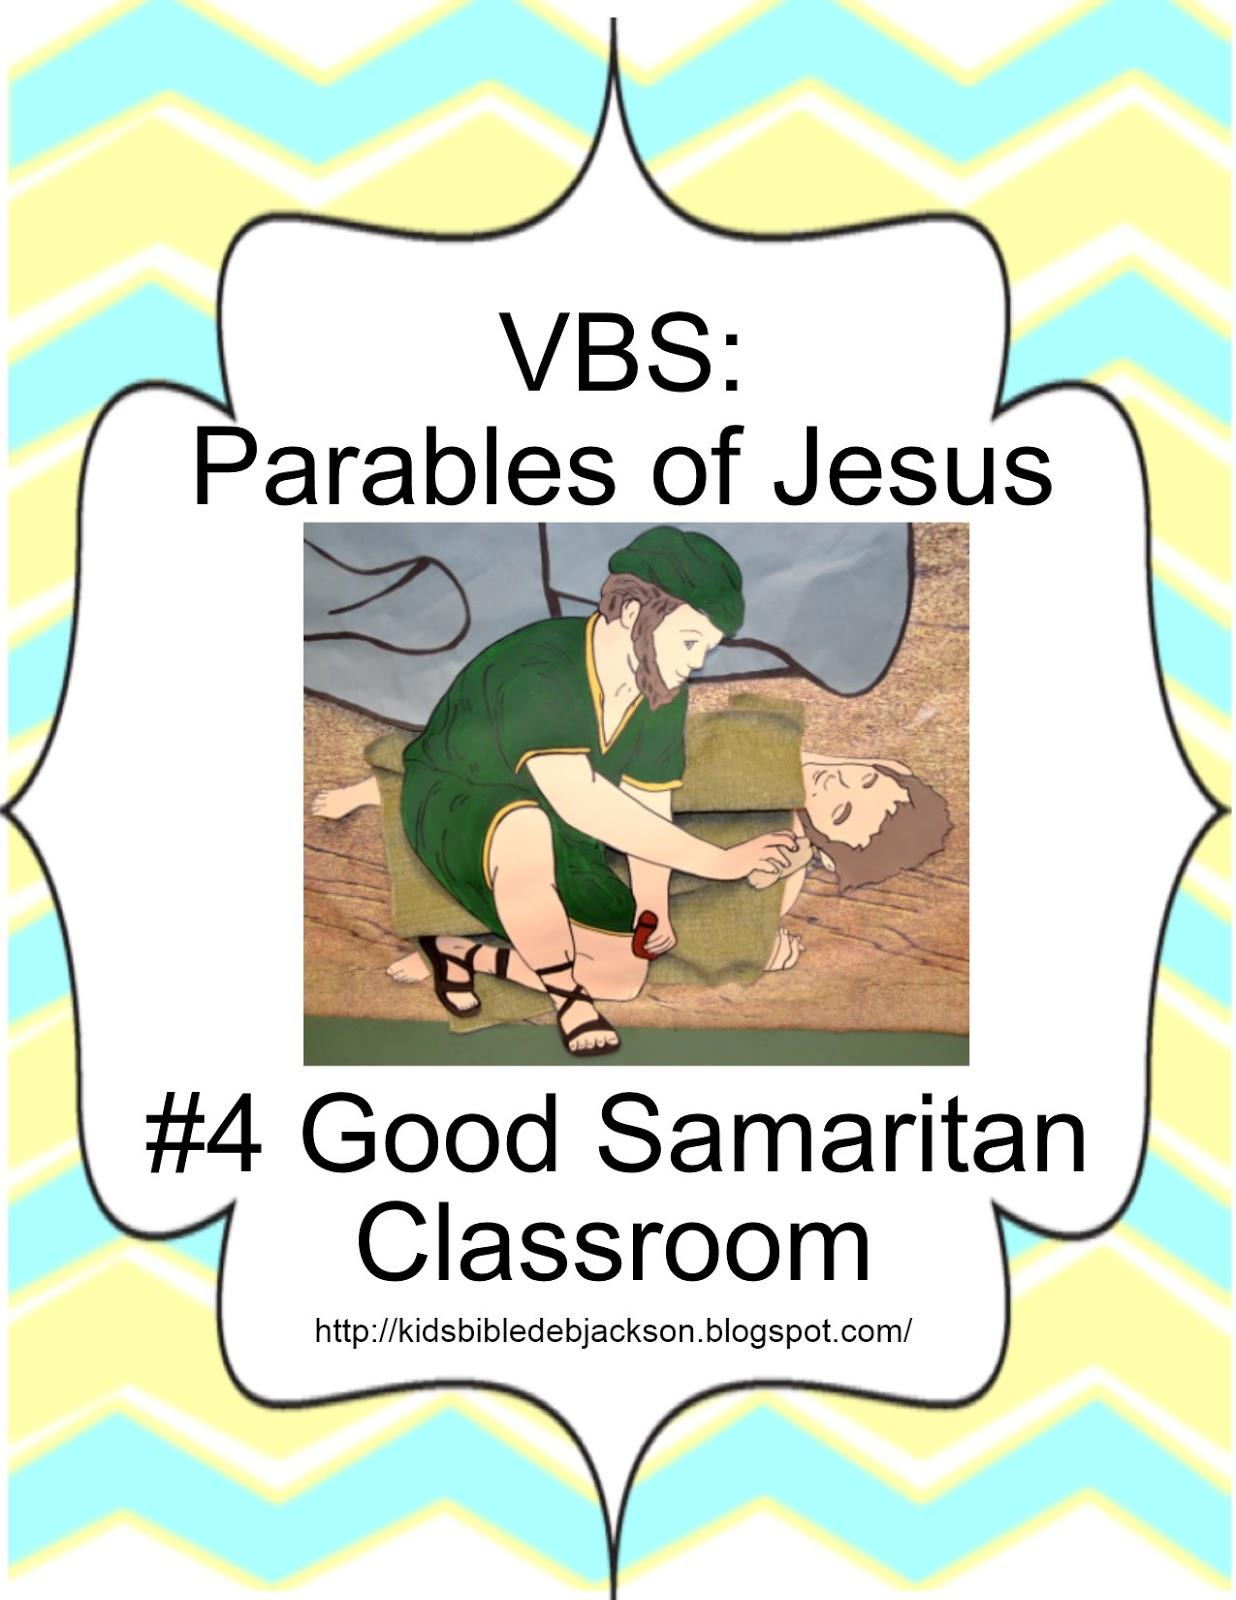 http://kidsbibledebjackson.blogspot.com/2014/06/parables-of-jesus-vbs-day-4-good.html